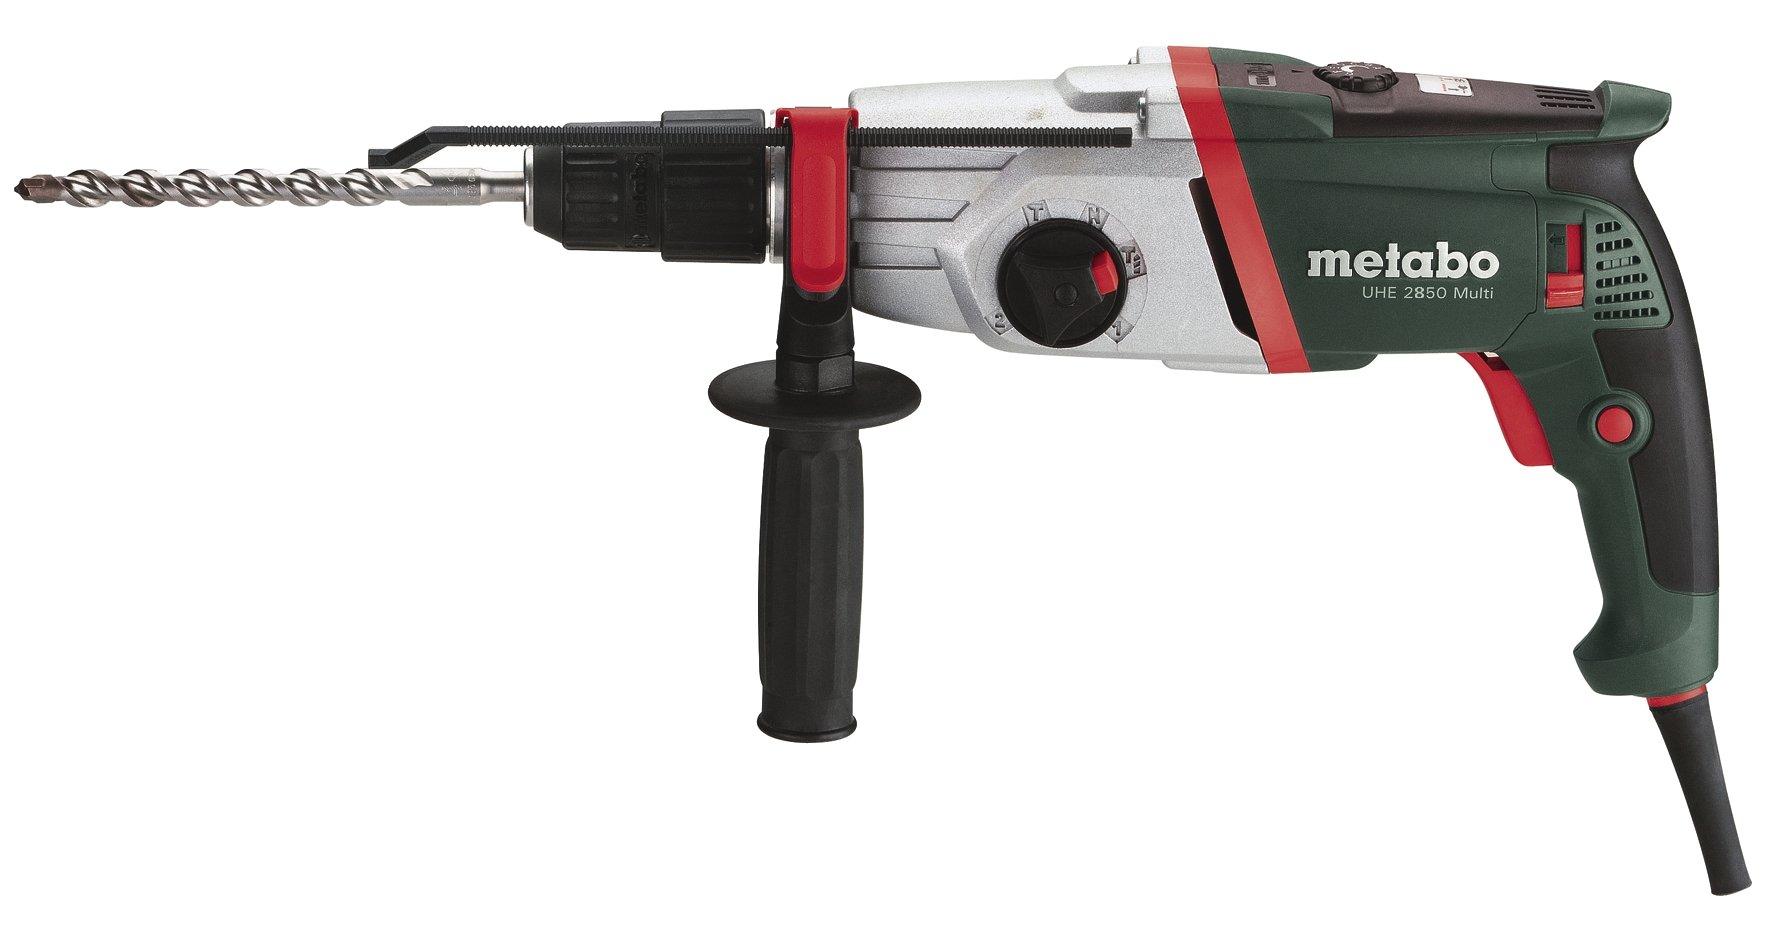 Metabo-600712000-UHE-2850-Multi-Bohrhammer-1010-W-TOOLS